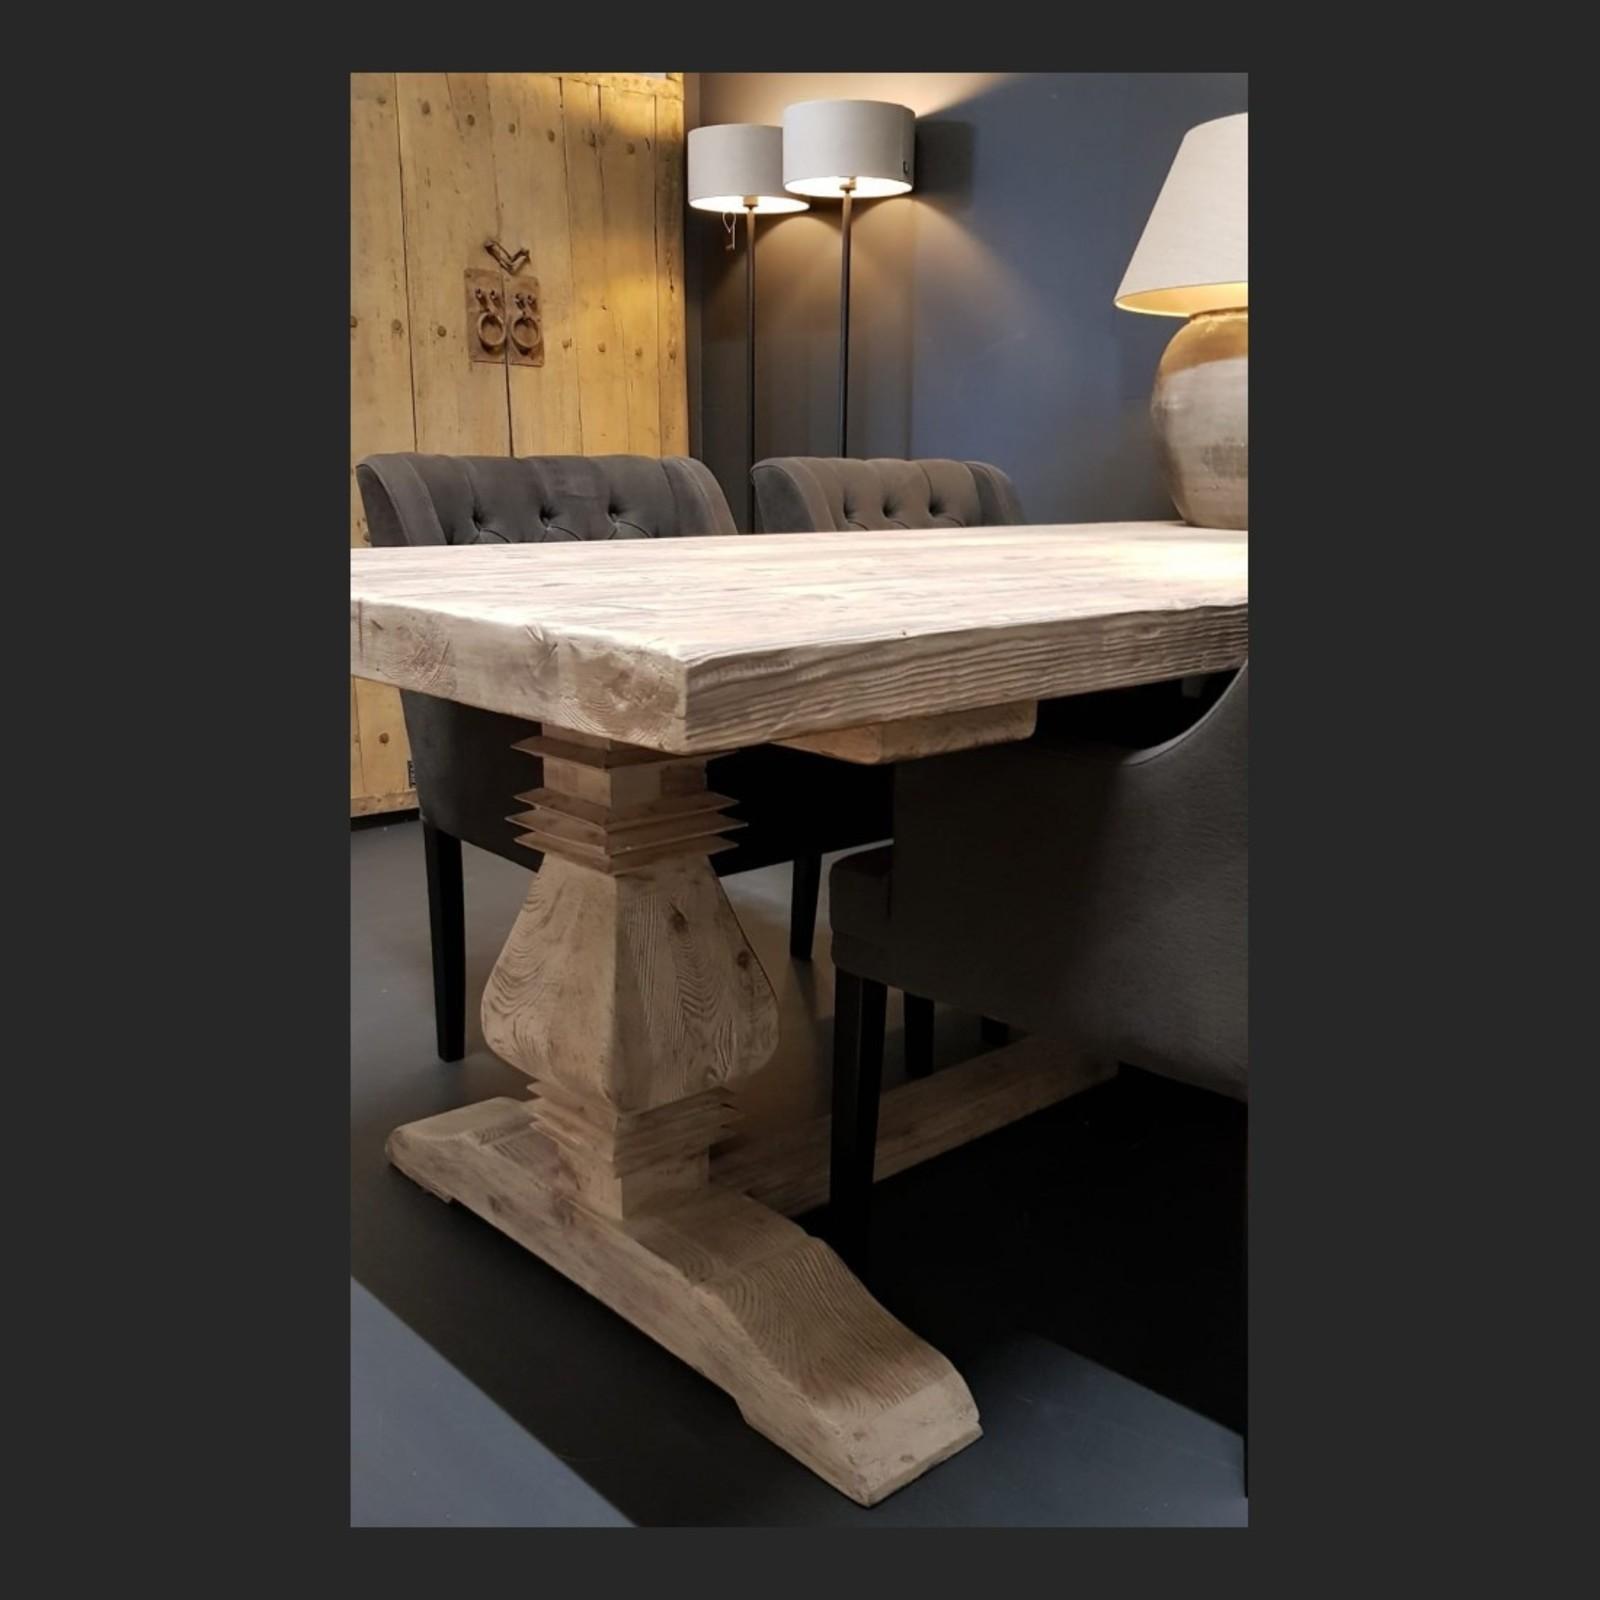 Luksa Oud houten klooster eettafel 220x100 cm